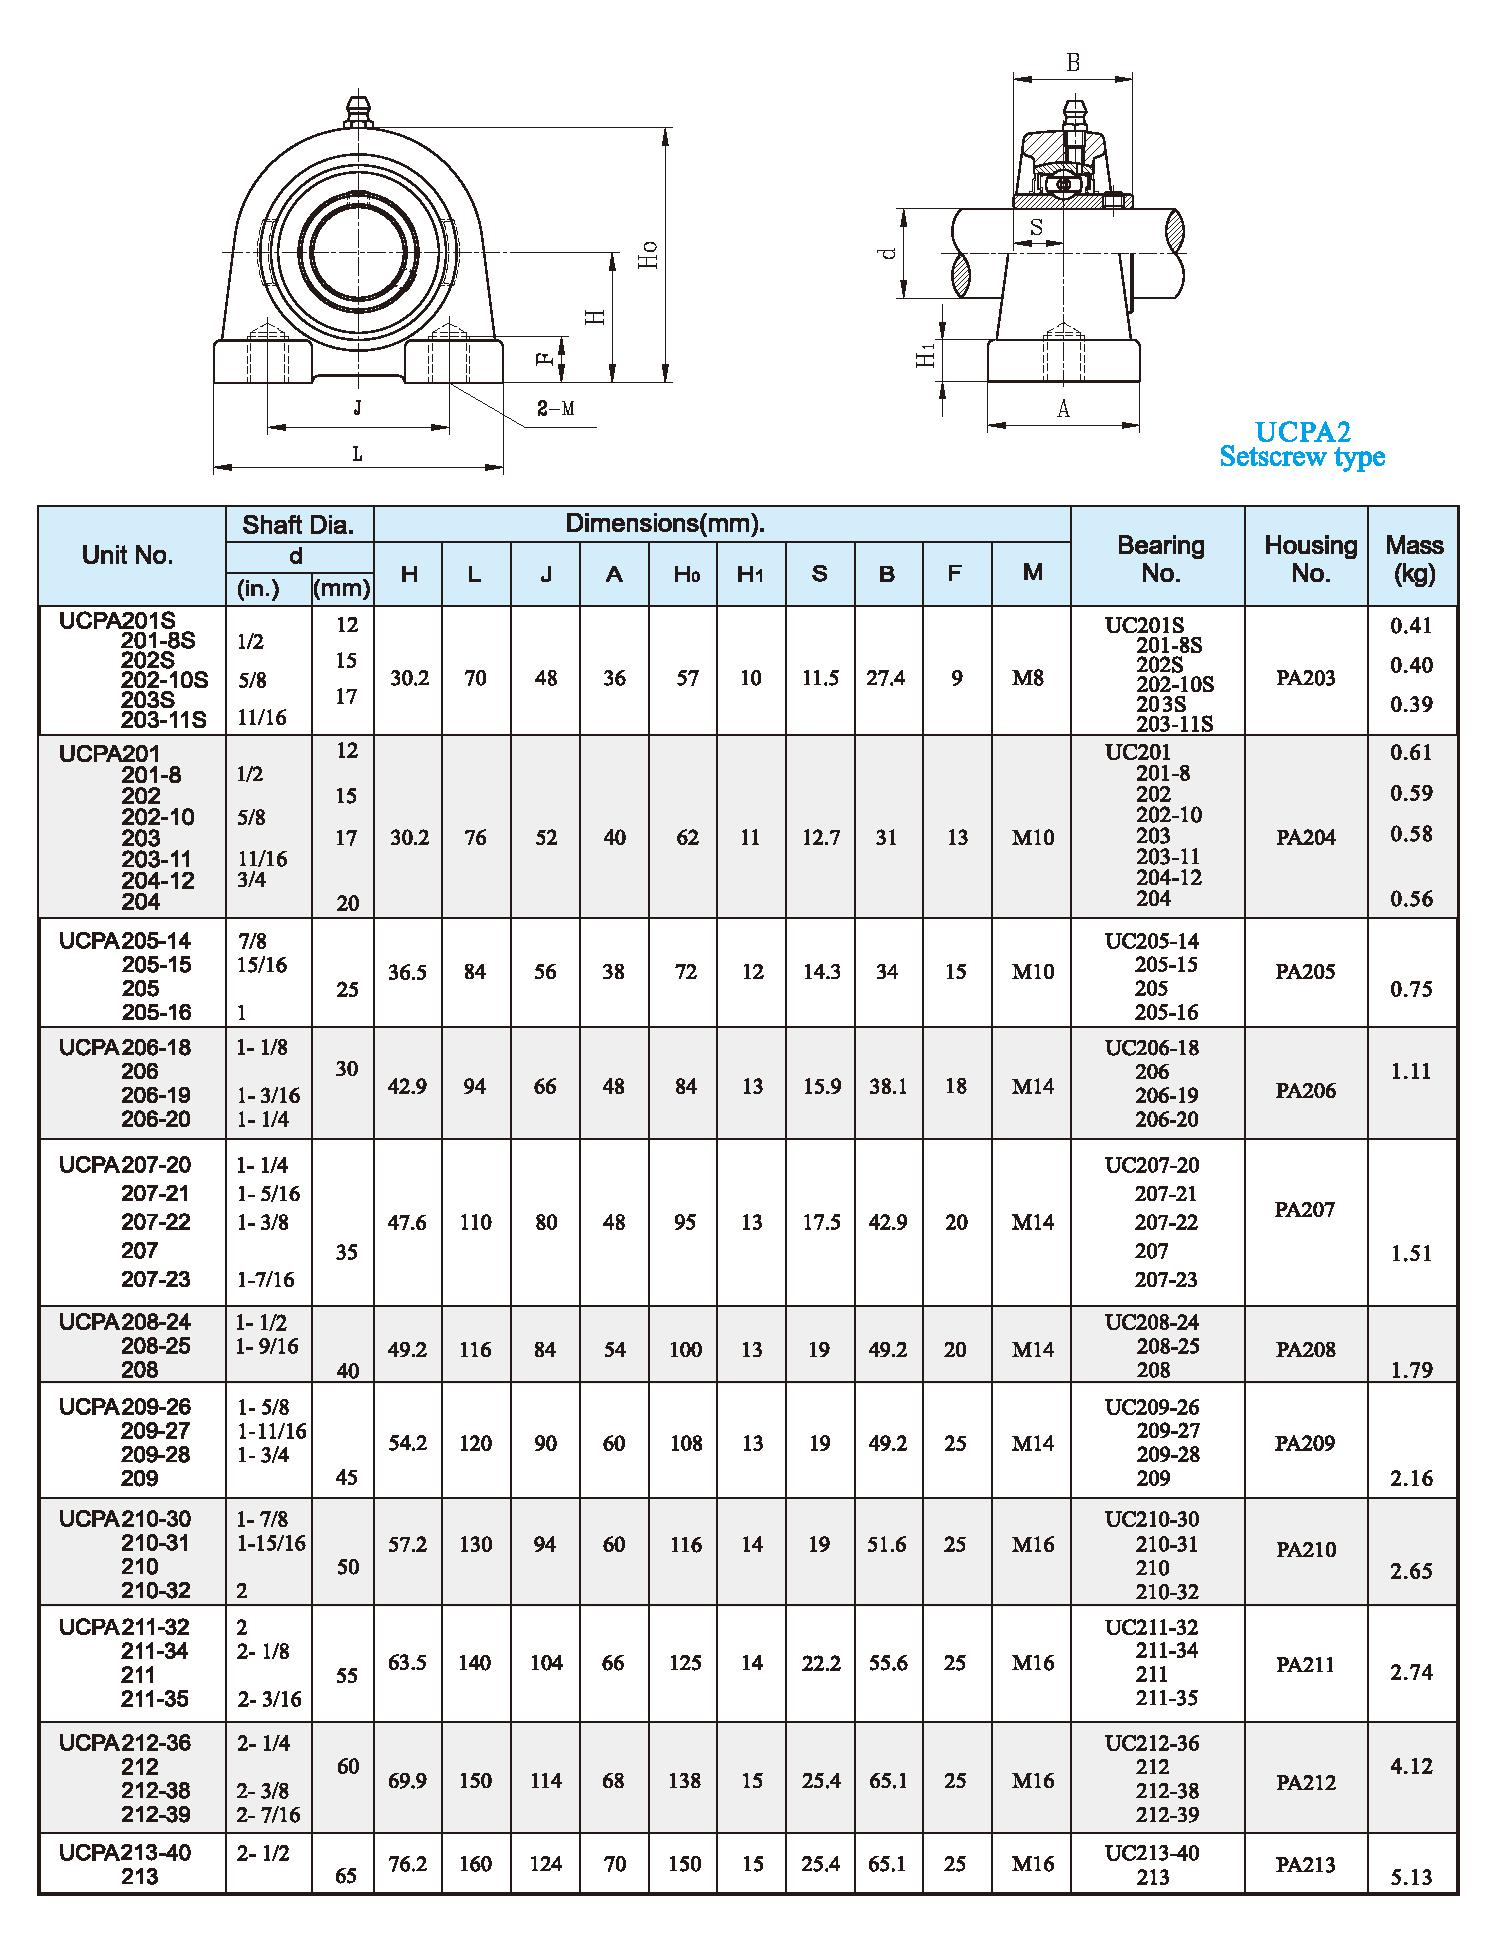 UCPA2 Setscrew type